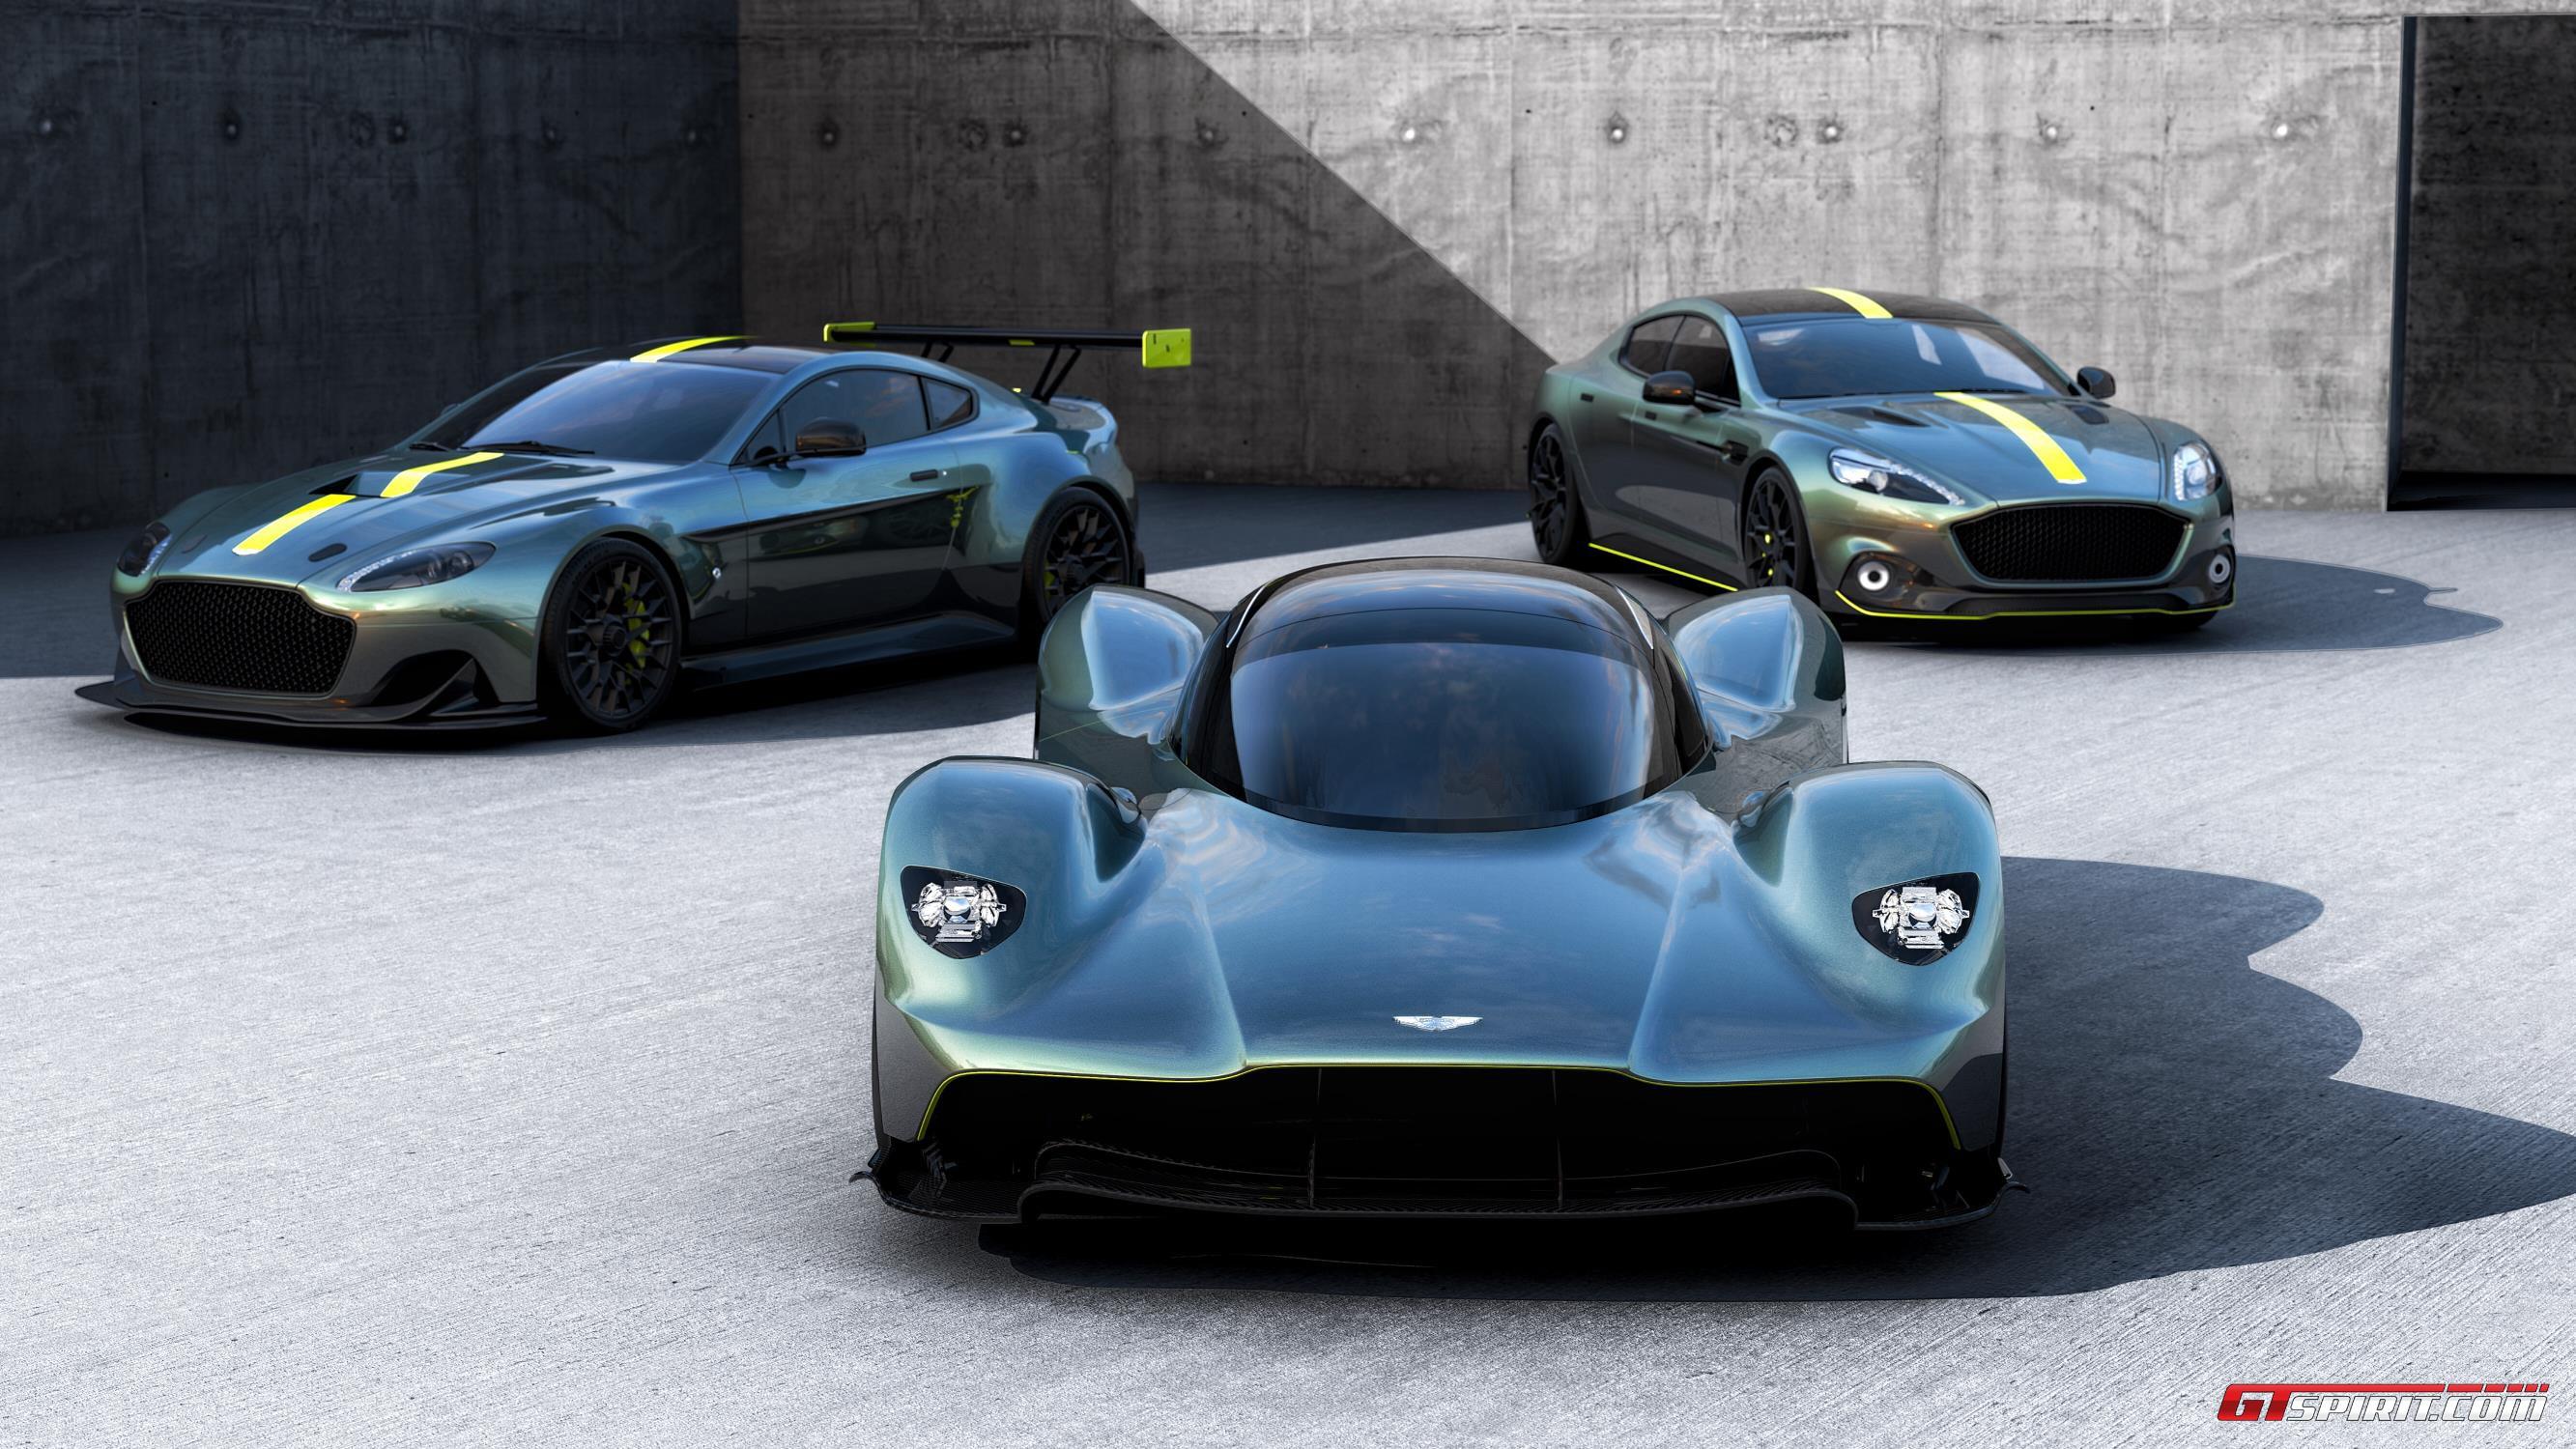 Aston Martin AM-RB 001: call it Valkyrie